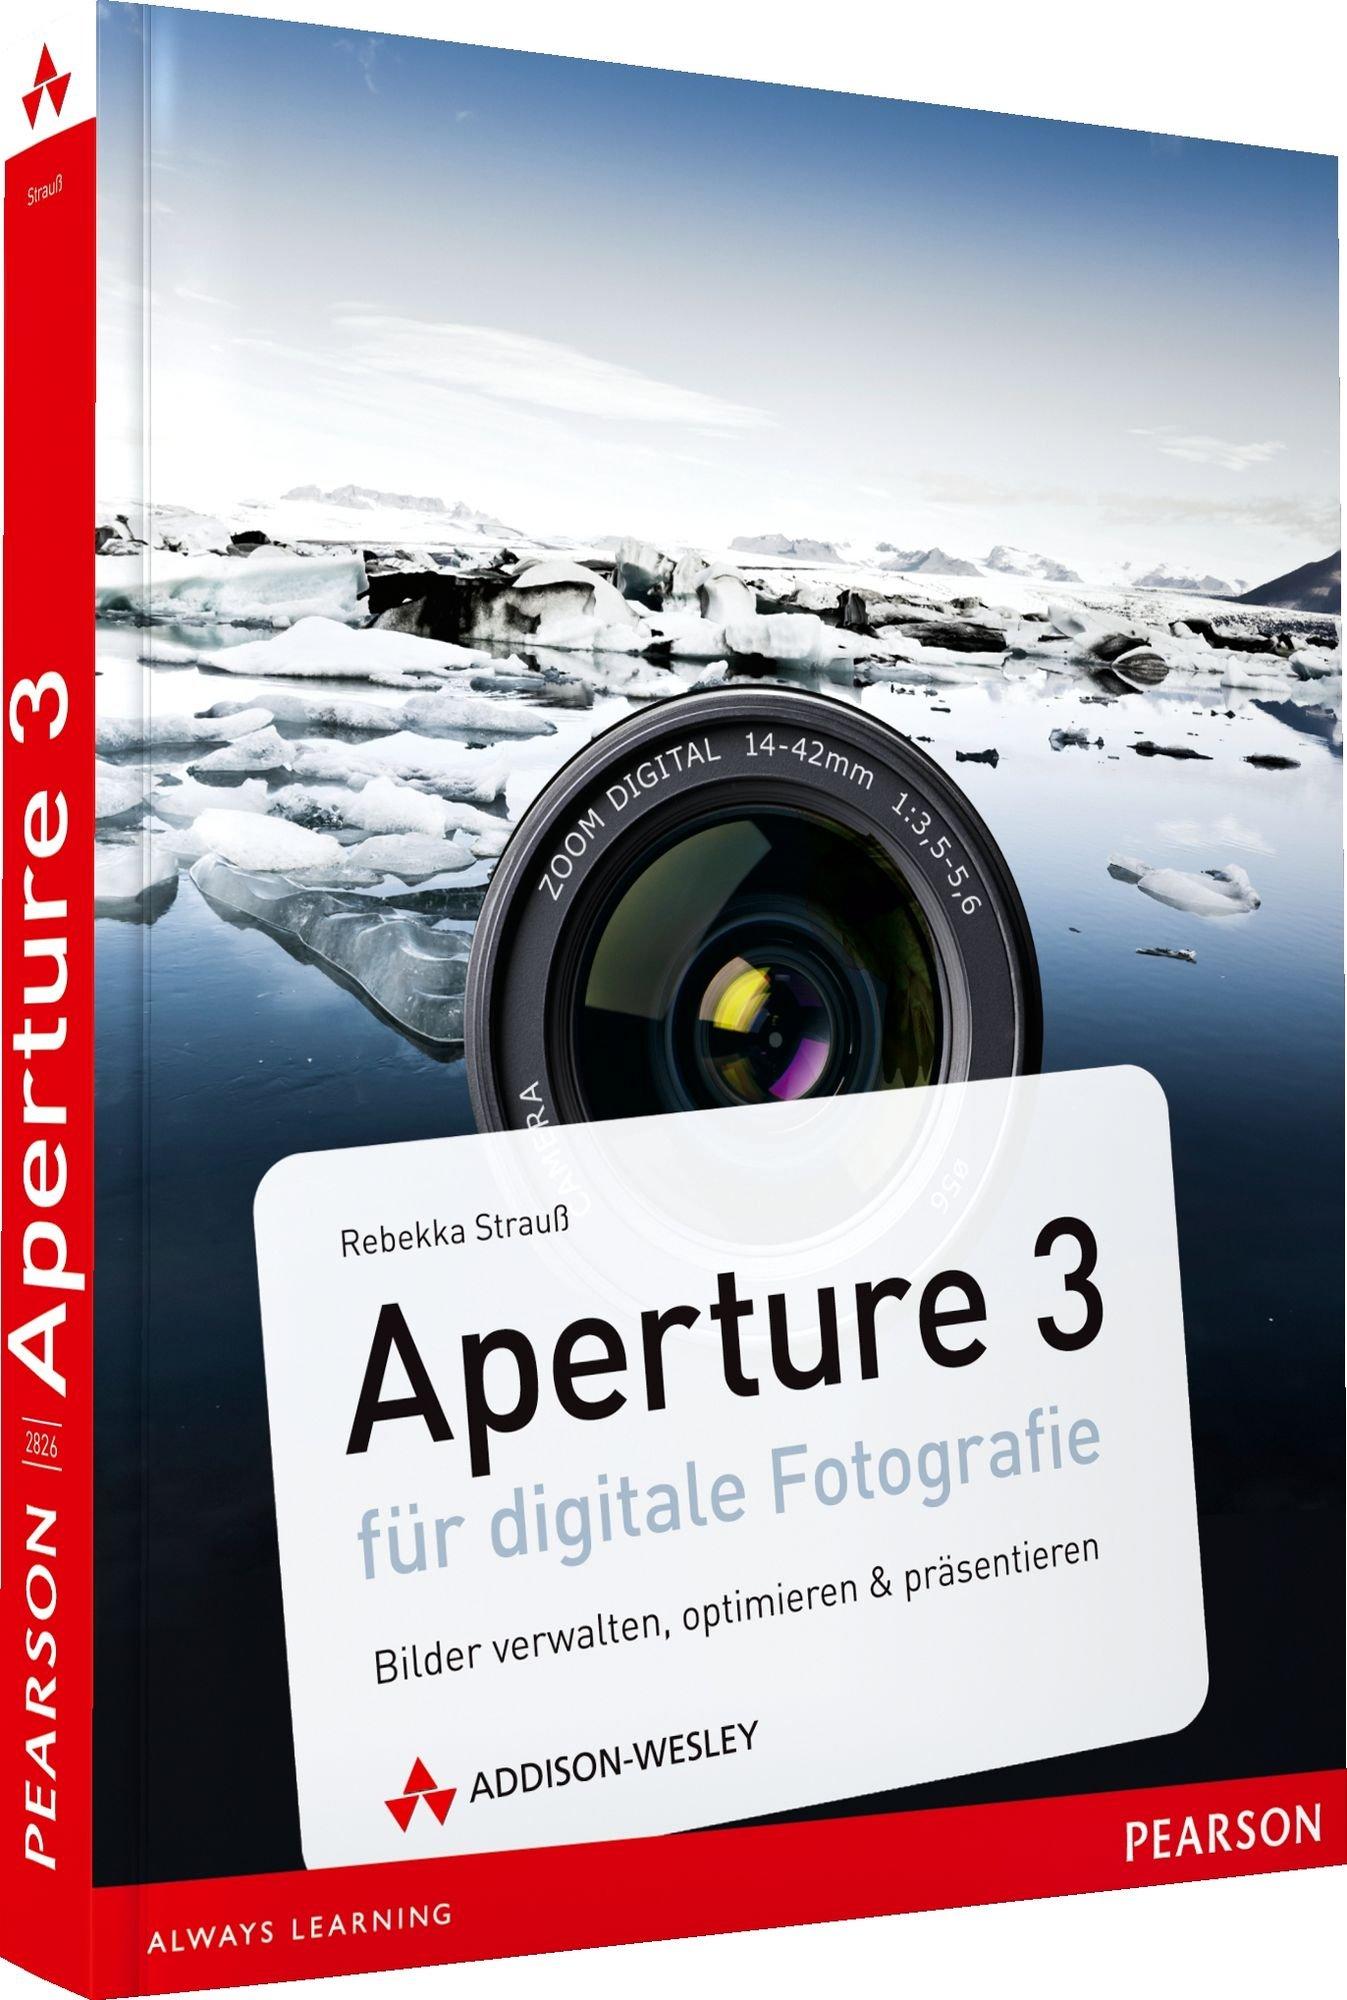 Aperture 3 für digitale Fotografie - Bilder verwalten, optimieren & präsentieren